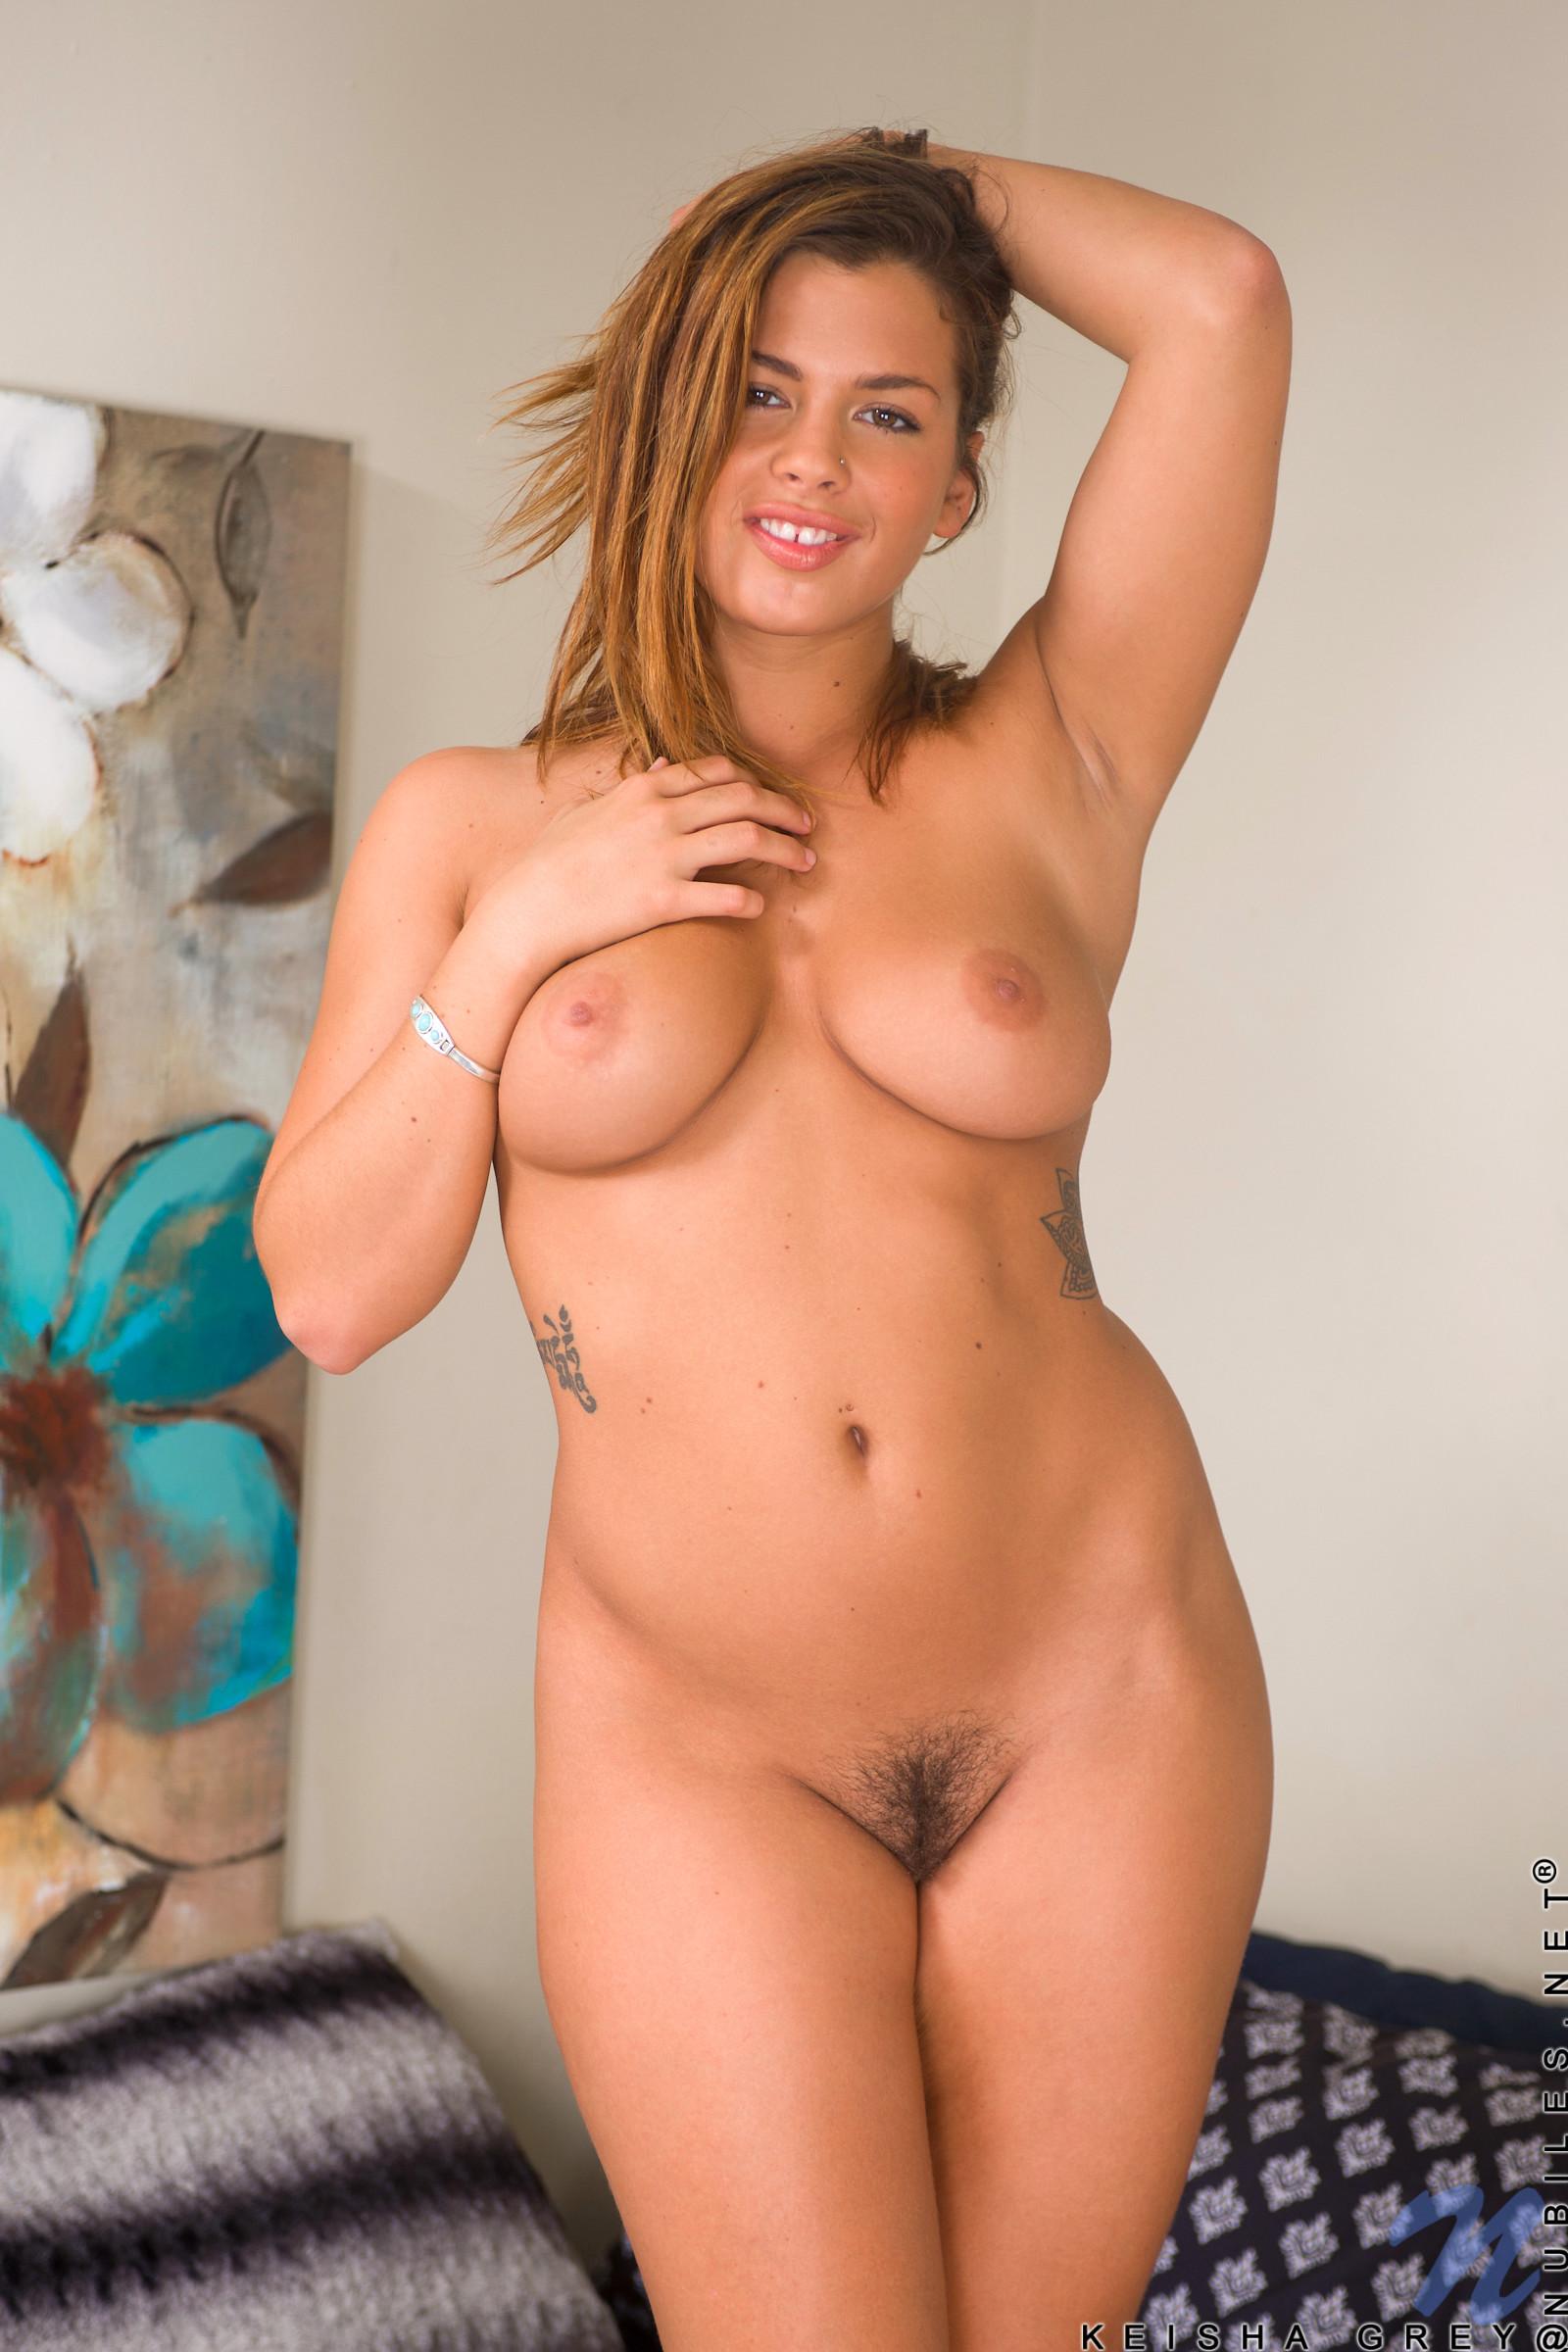 Keisha naked pics — img 13